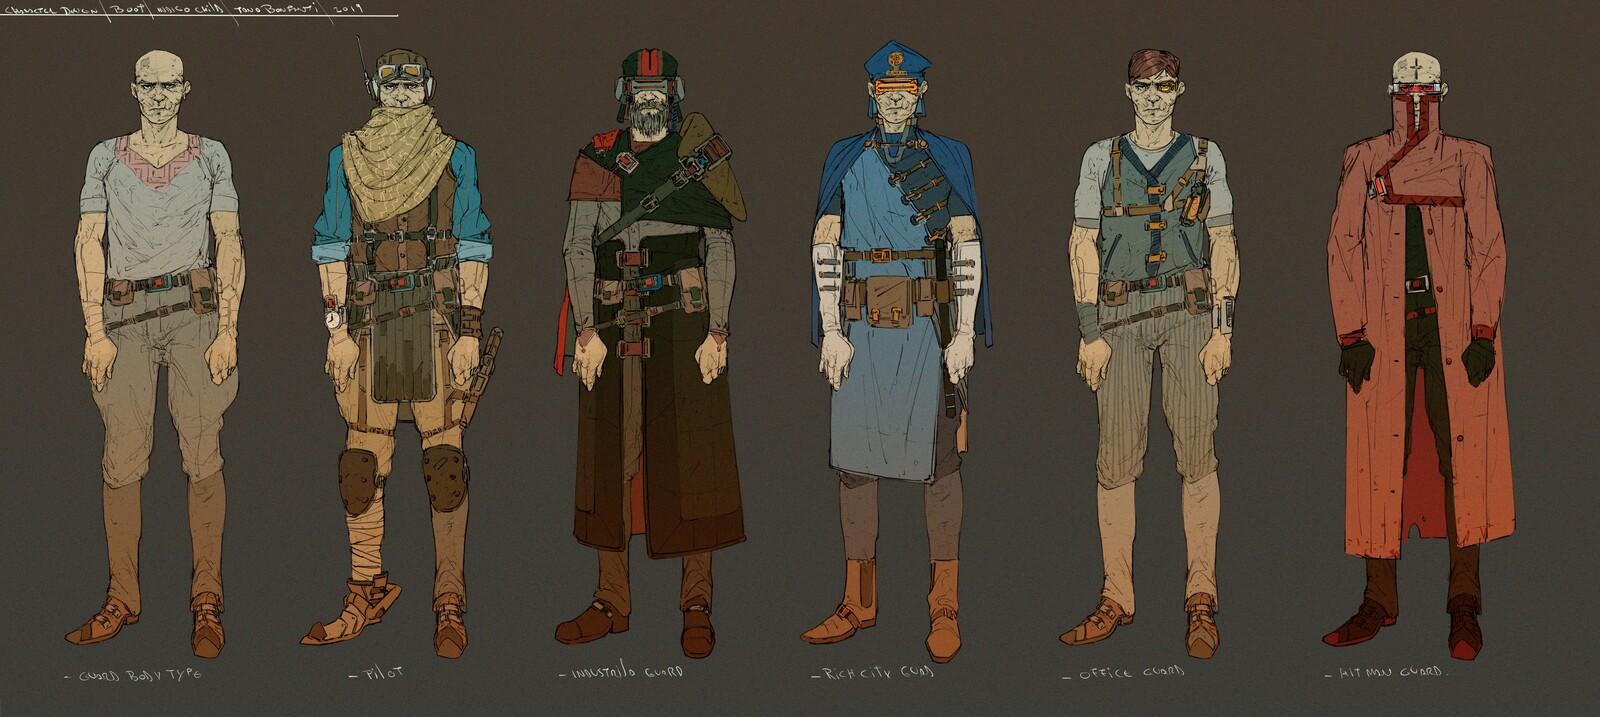 Character design - Guard - indigo child